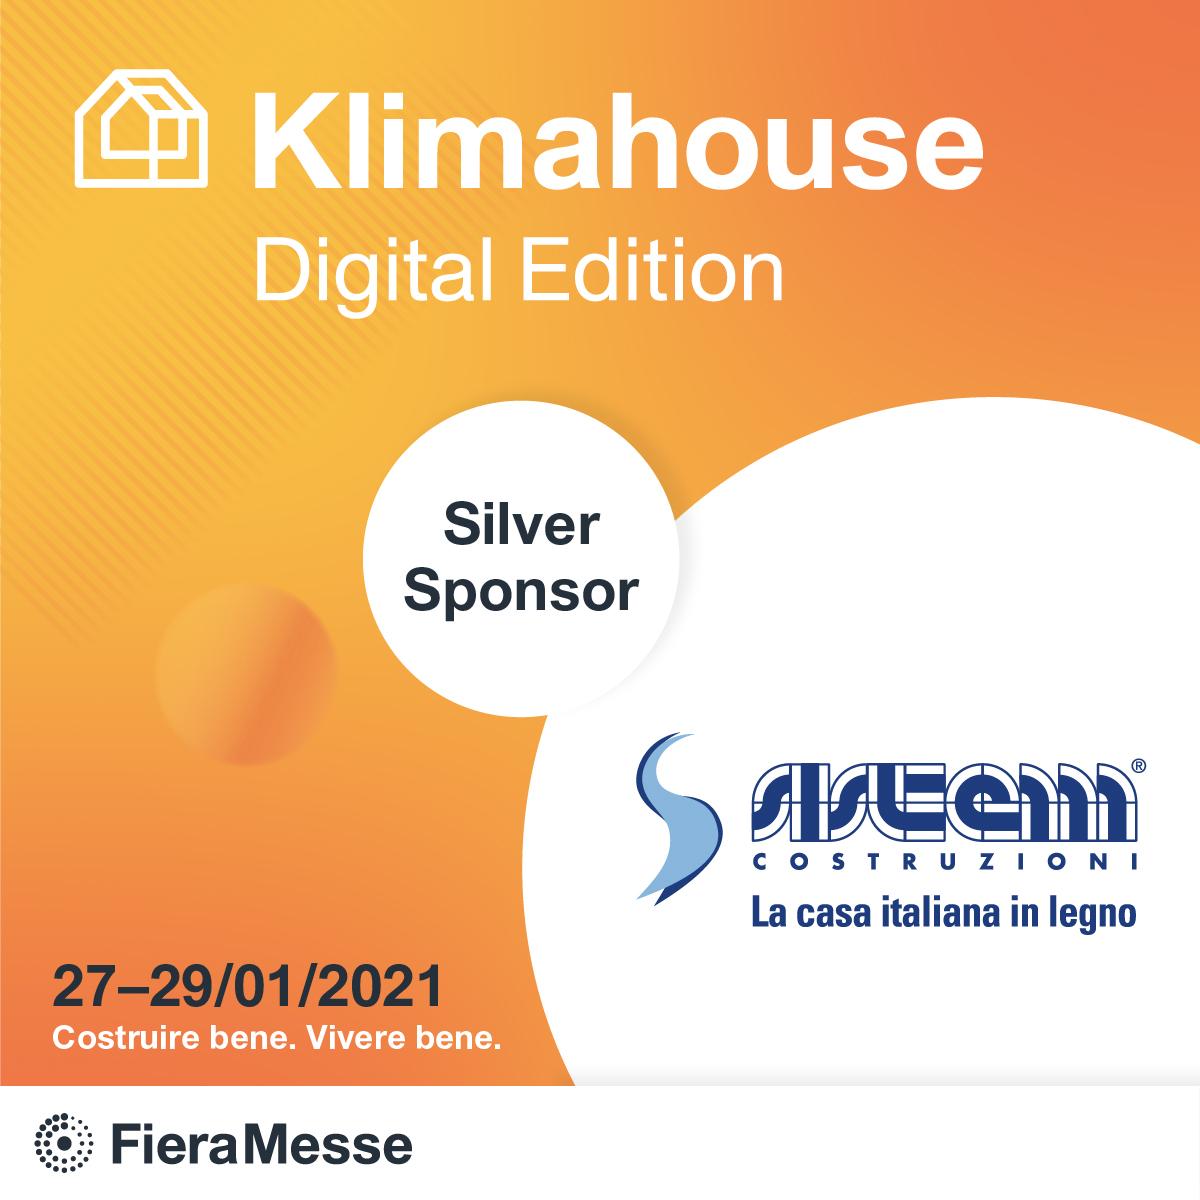 Sistem Costruzioni Sponsor di Klimahouse Digital Edition